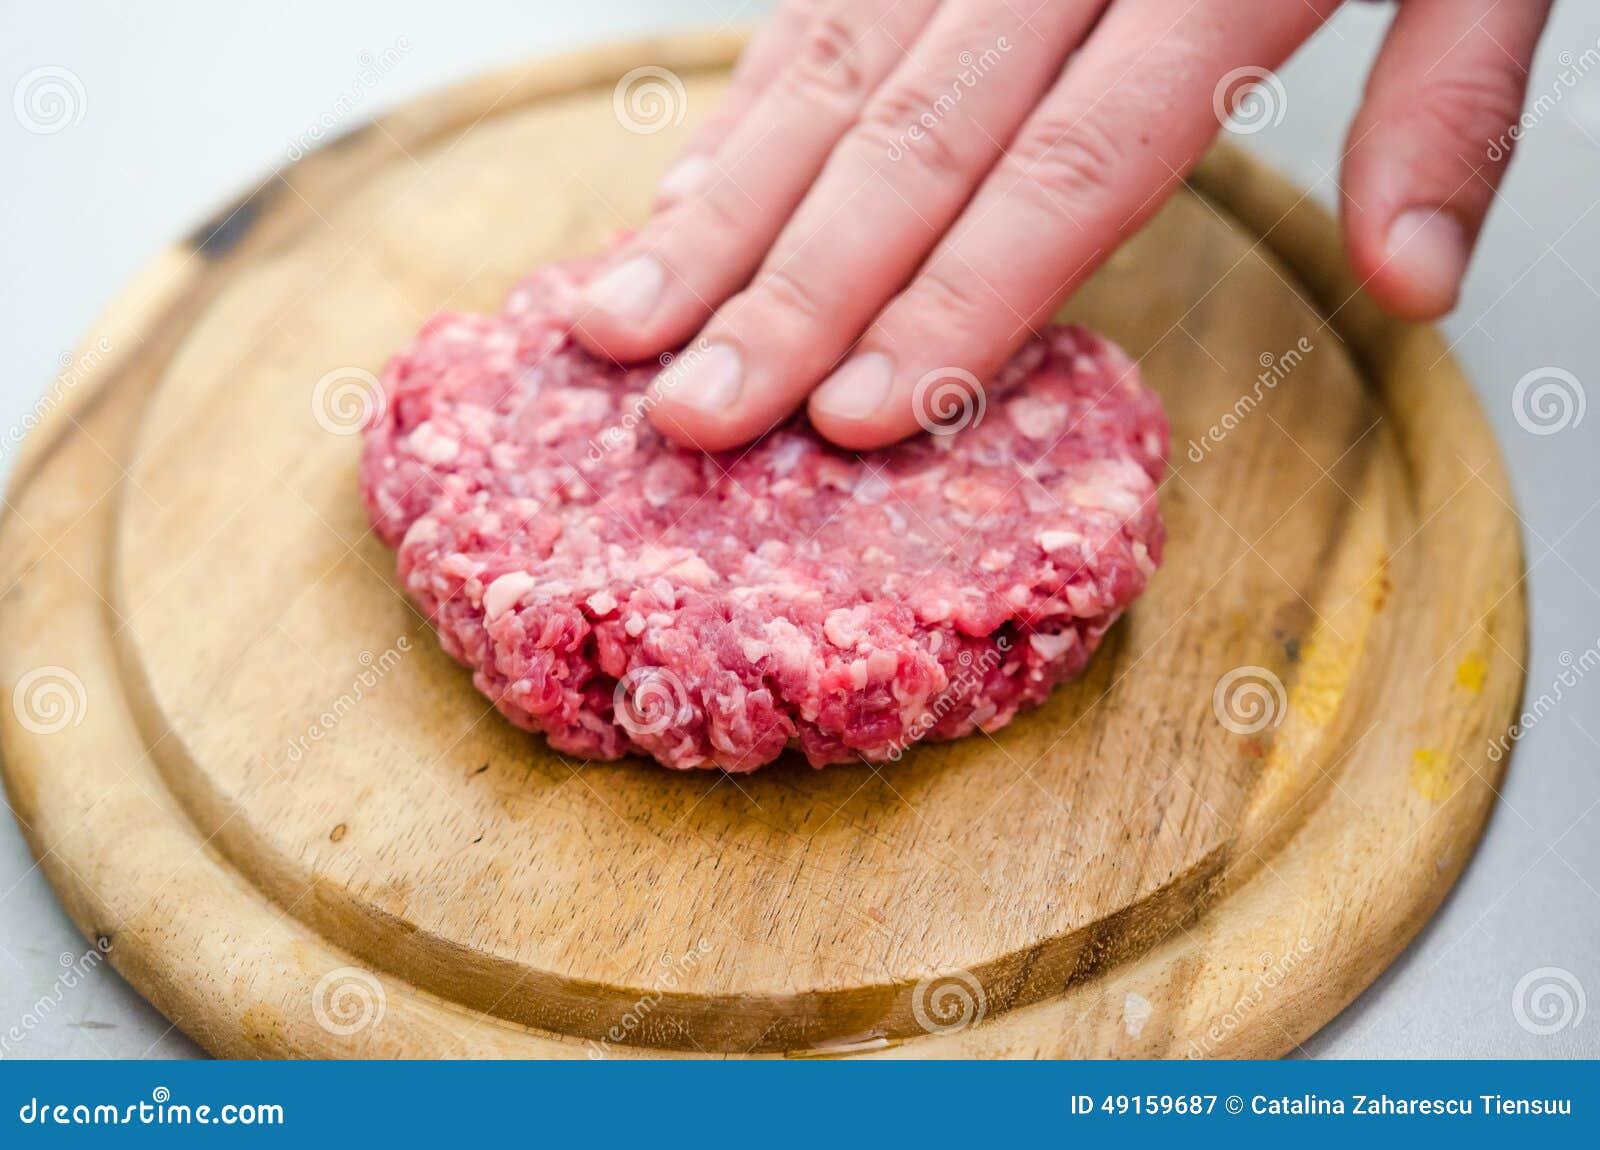 Shapping raw burger